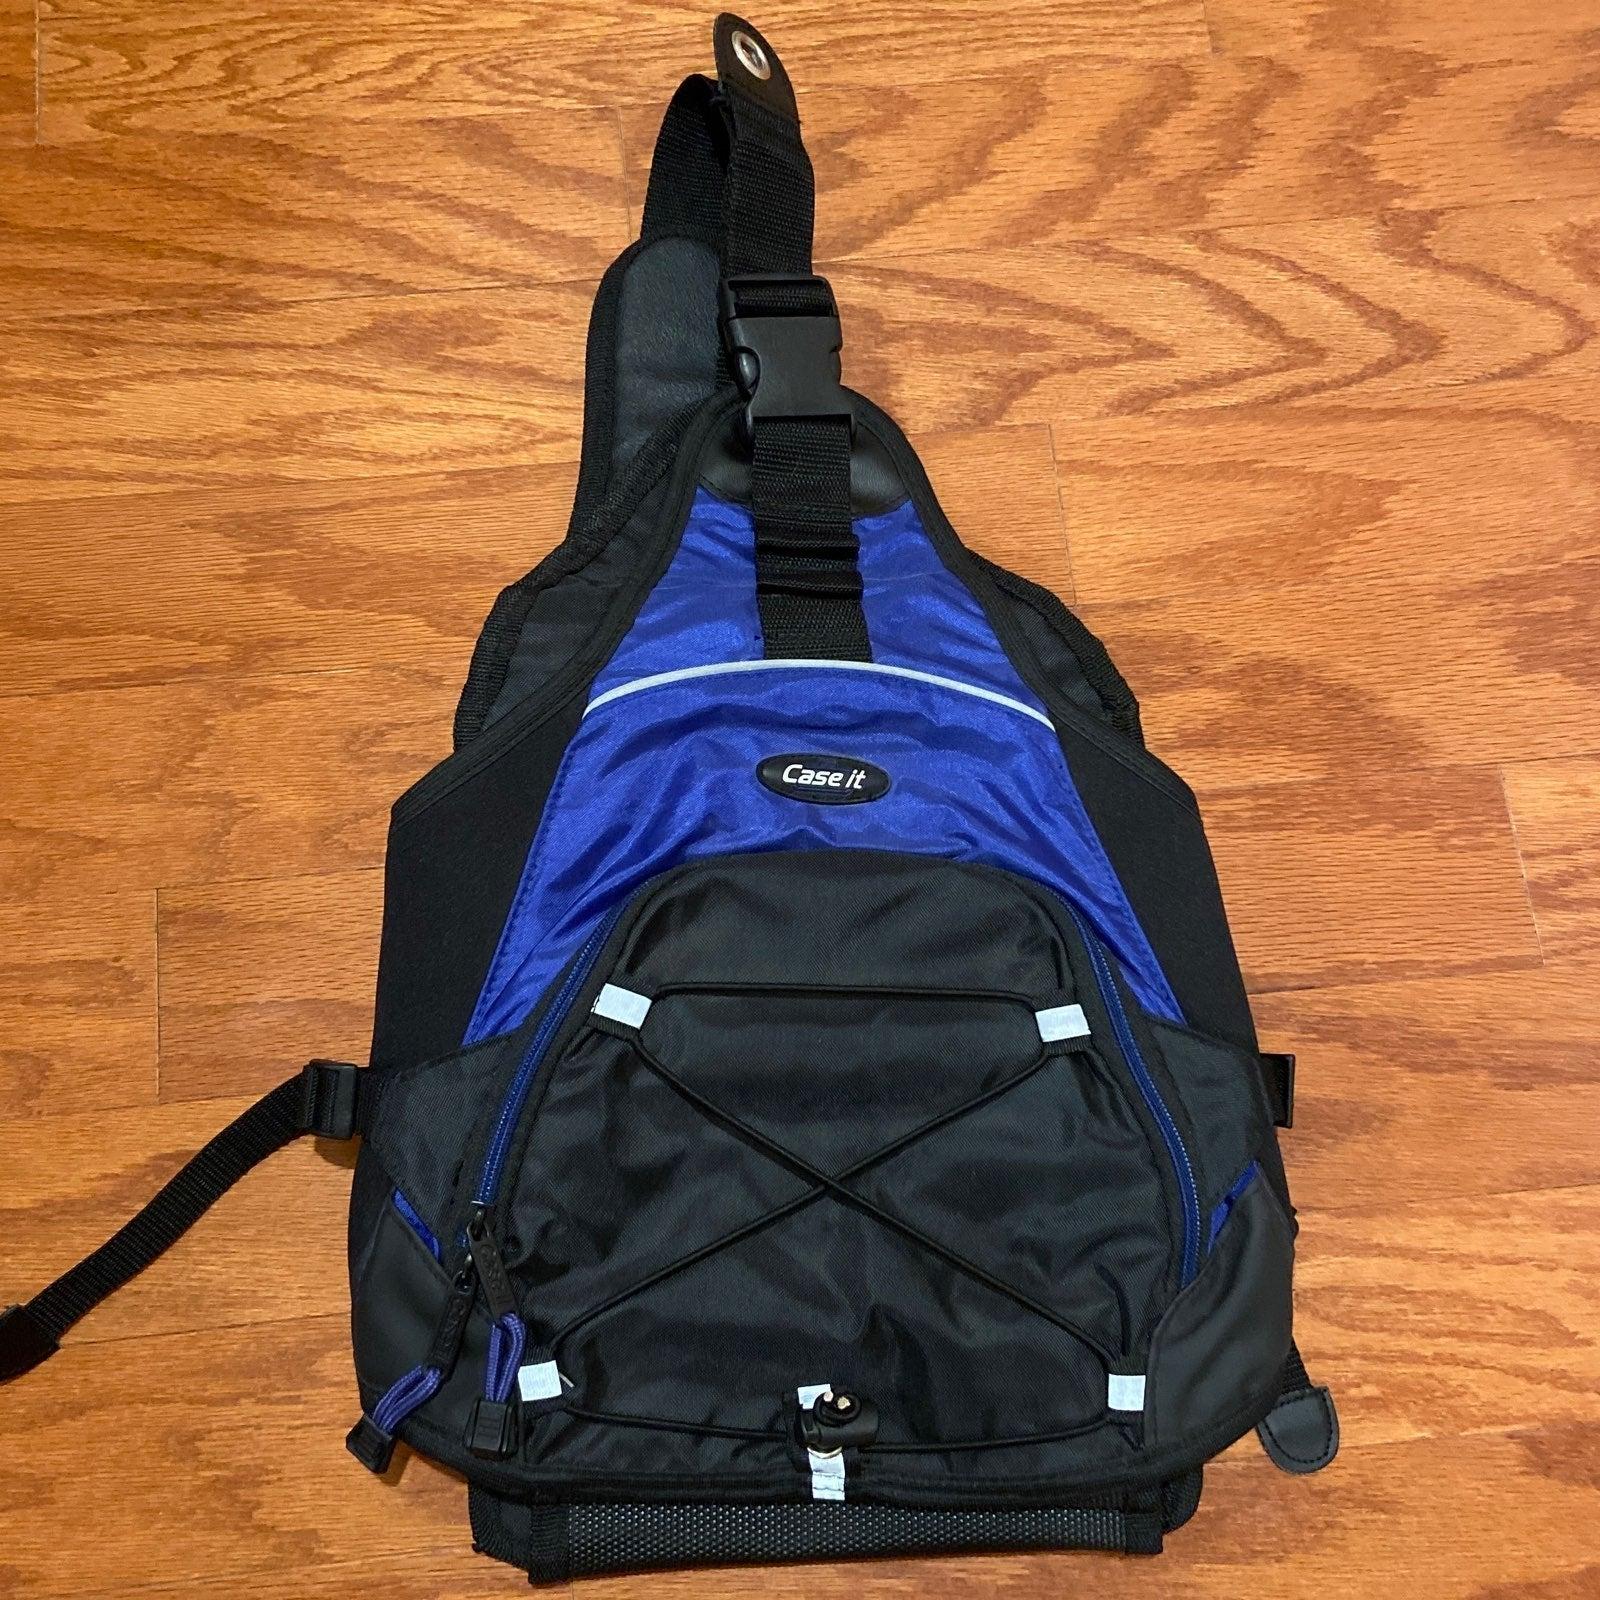 Case it backpack (book sling)